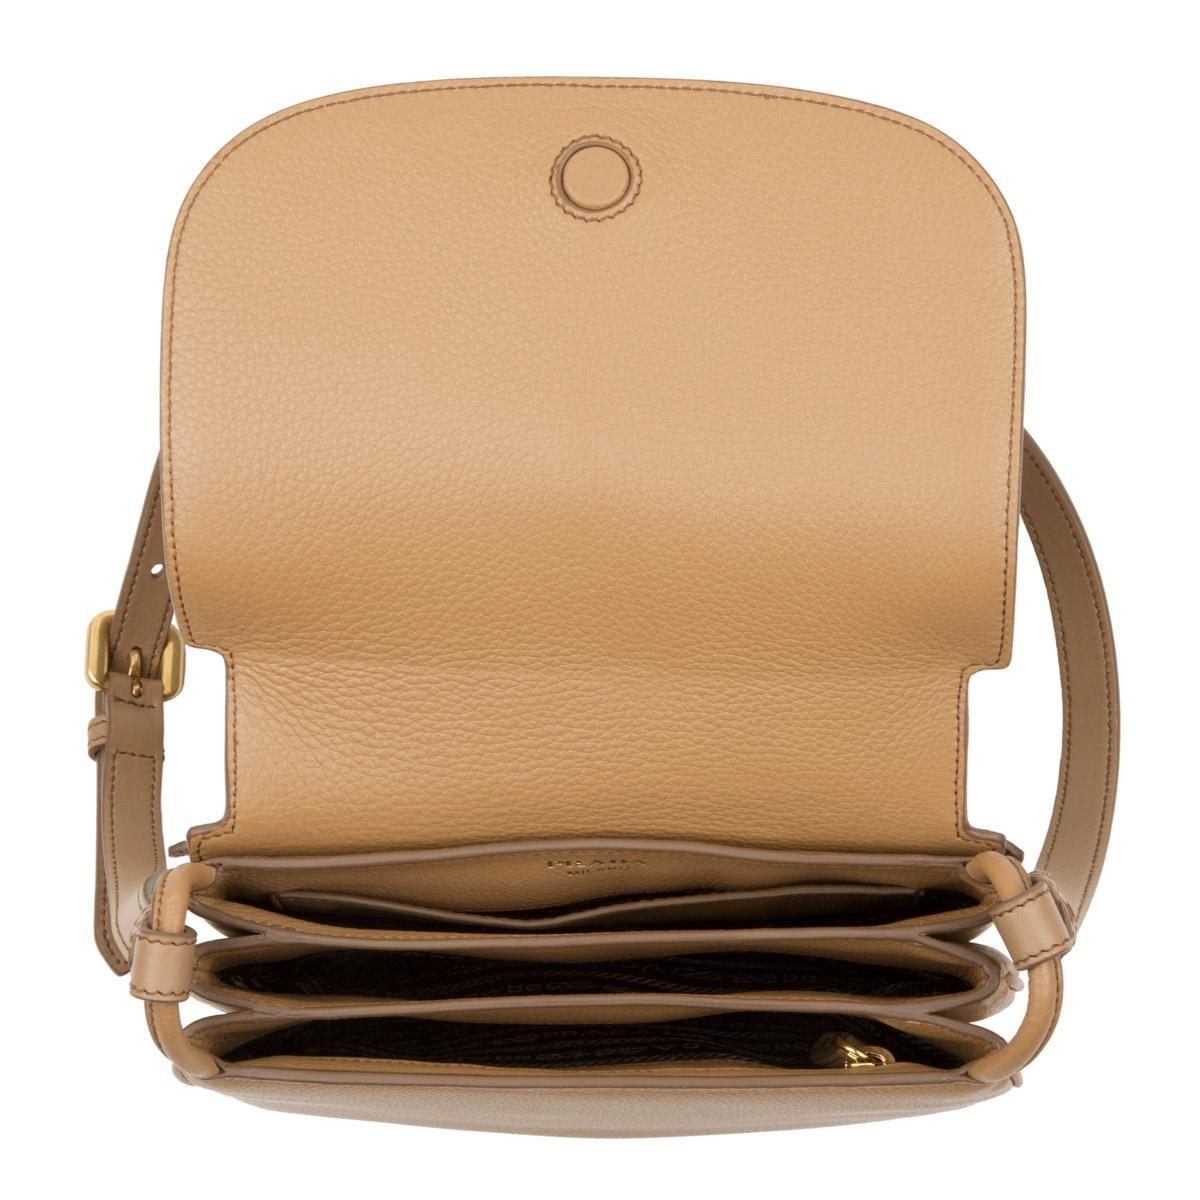 Prada Leather Vitello Daino Pattina Crossbody Bag Caramel in Grey